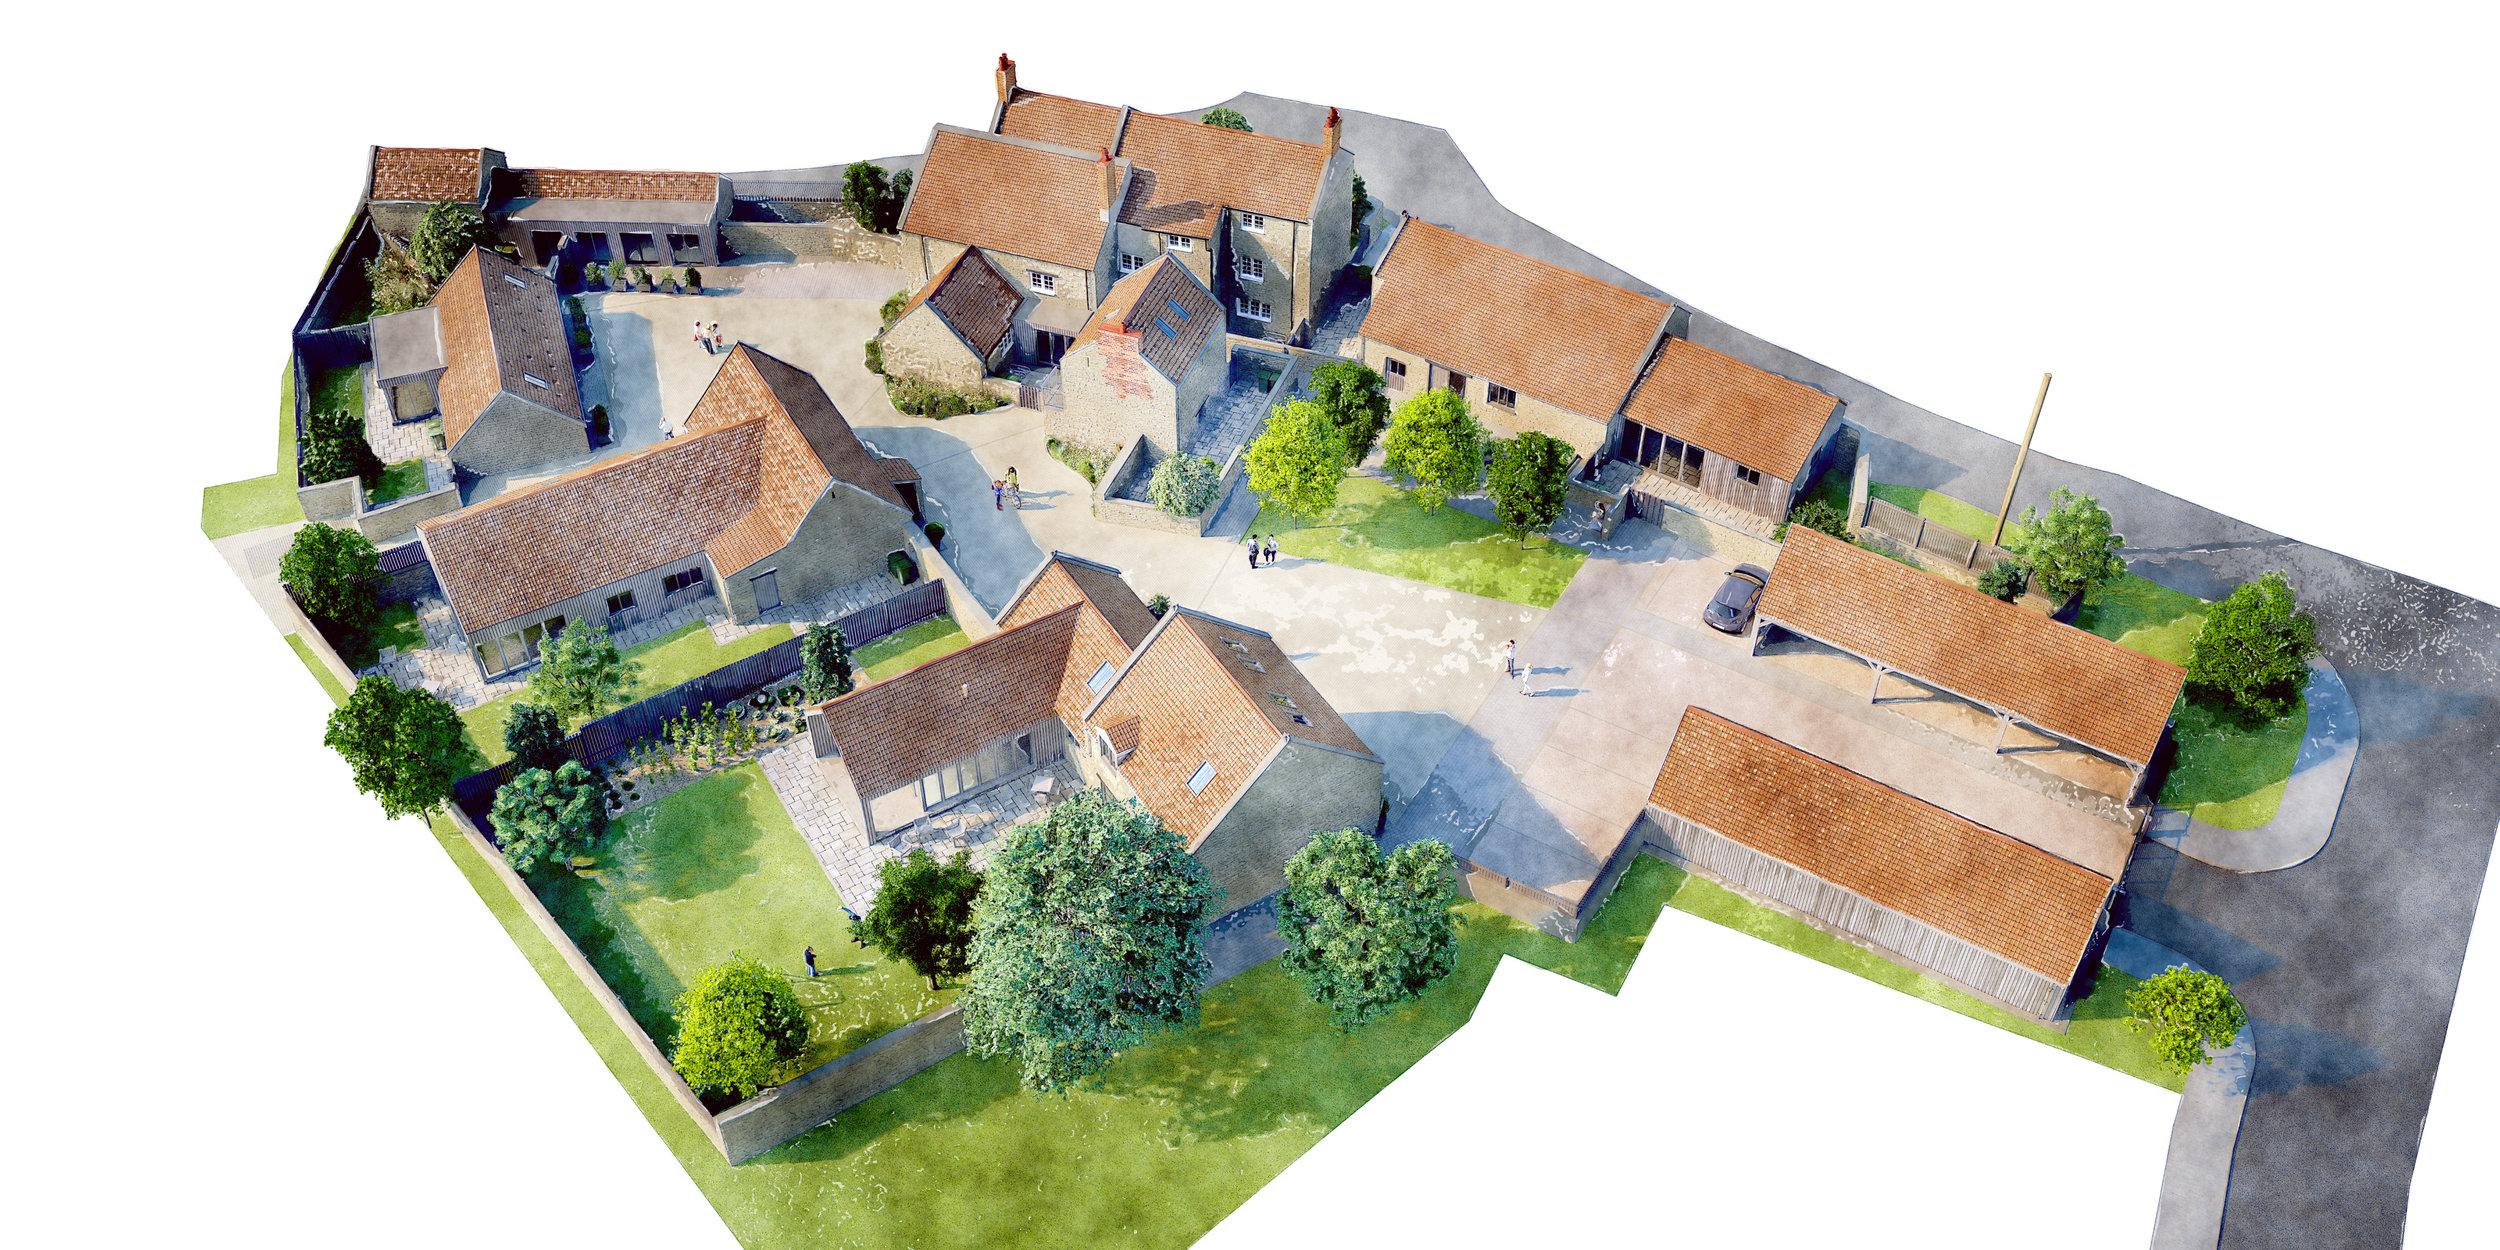 Copy of housing